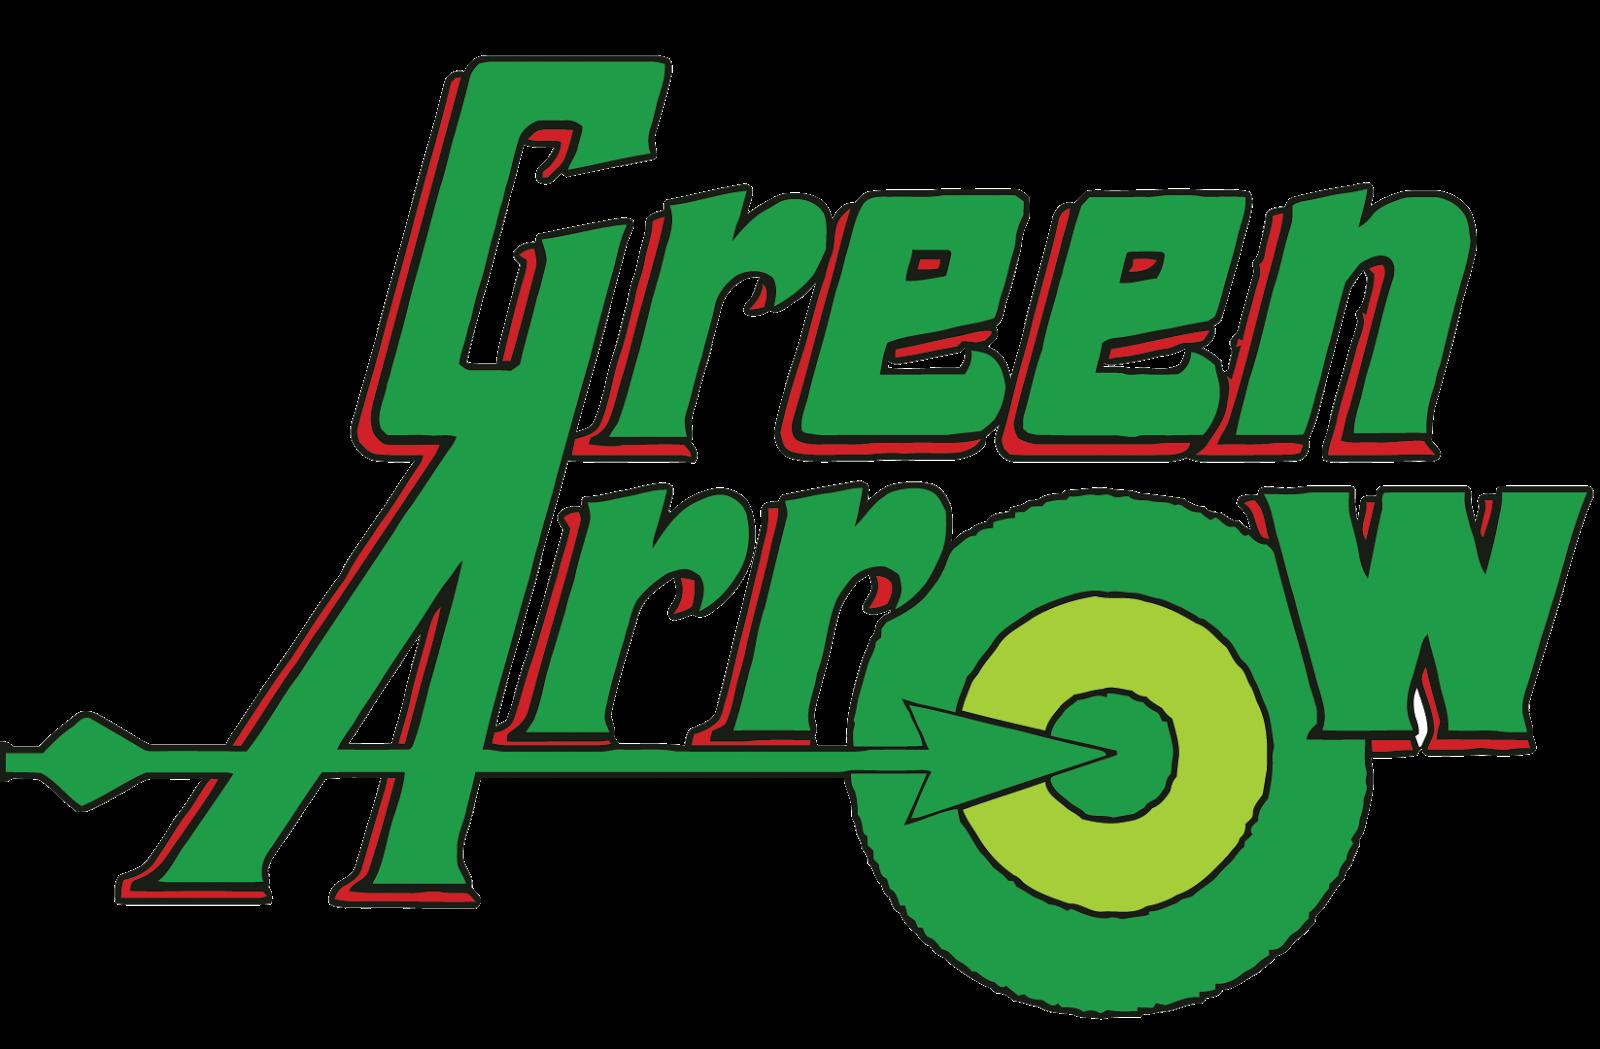 Arrow Hawkeye Would Green Win Or Who